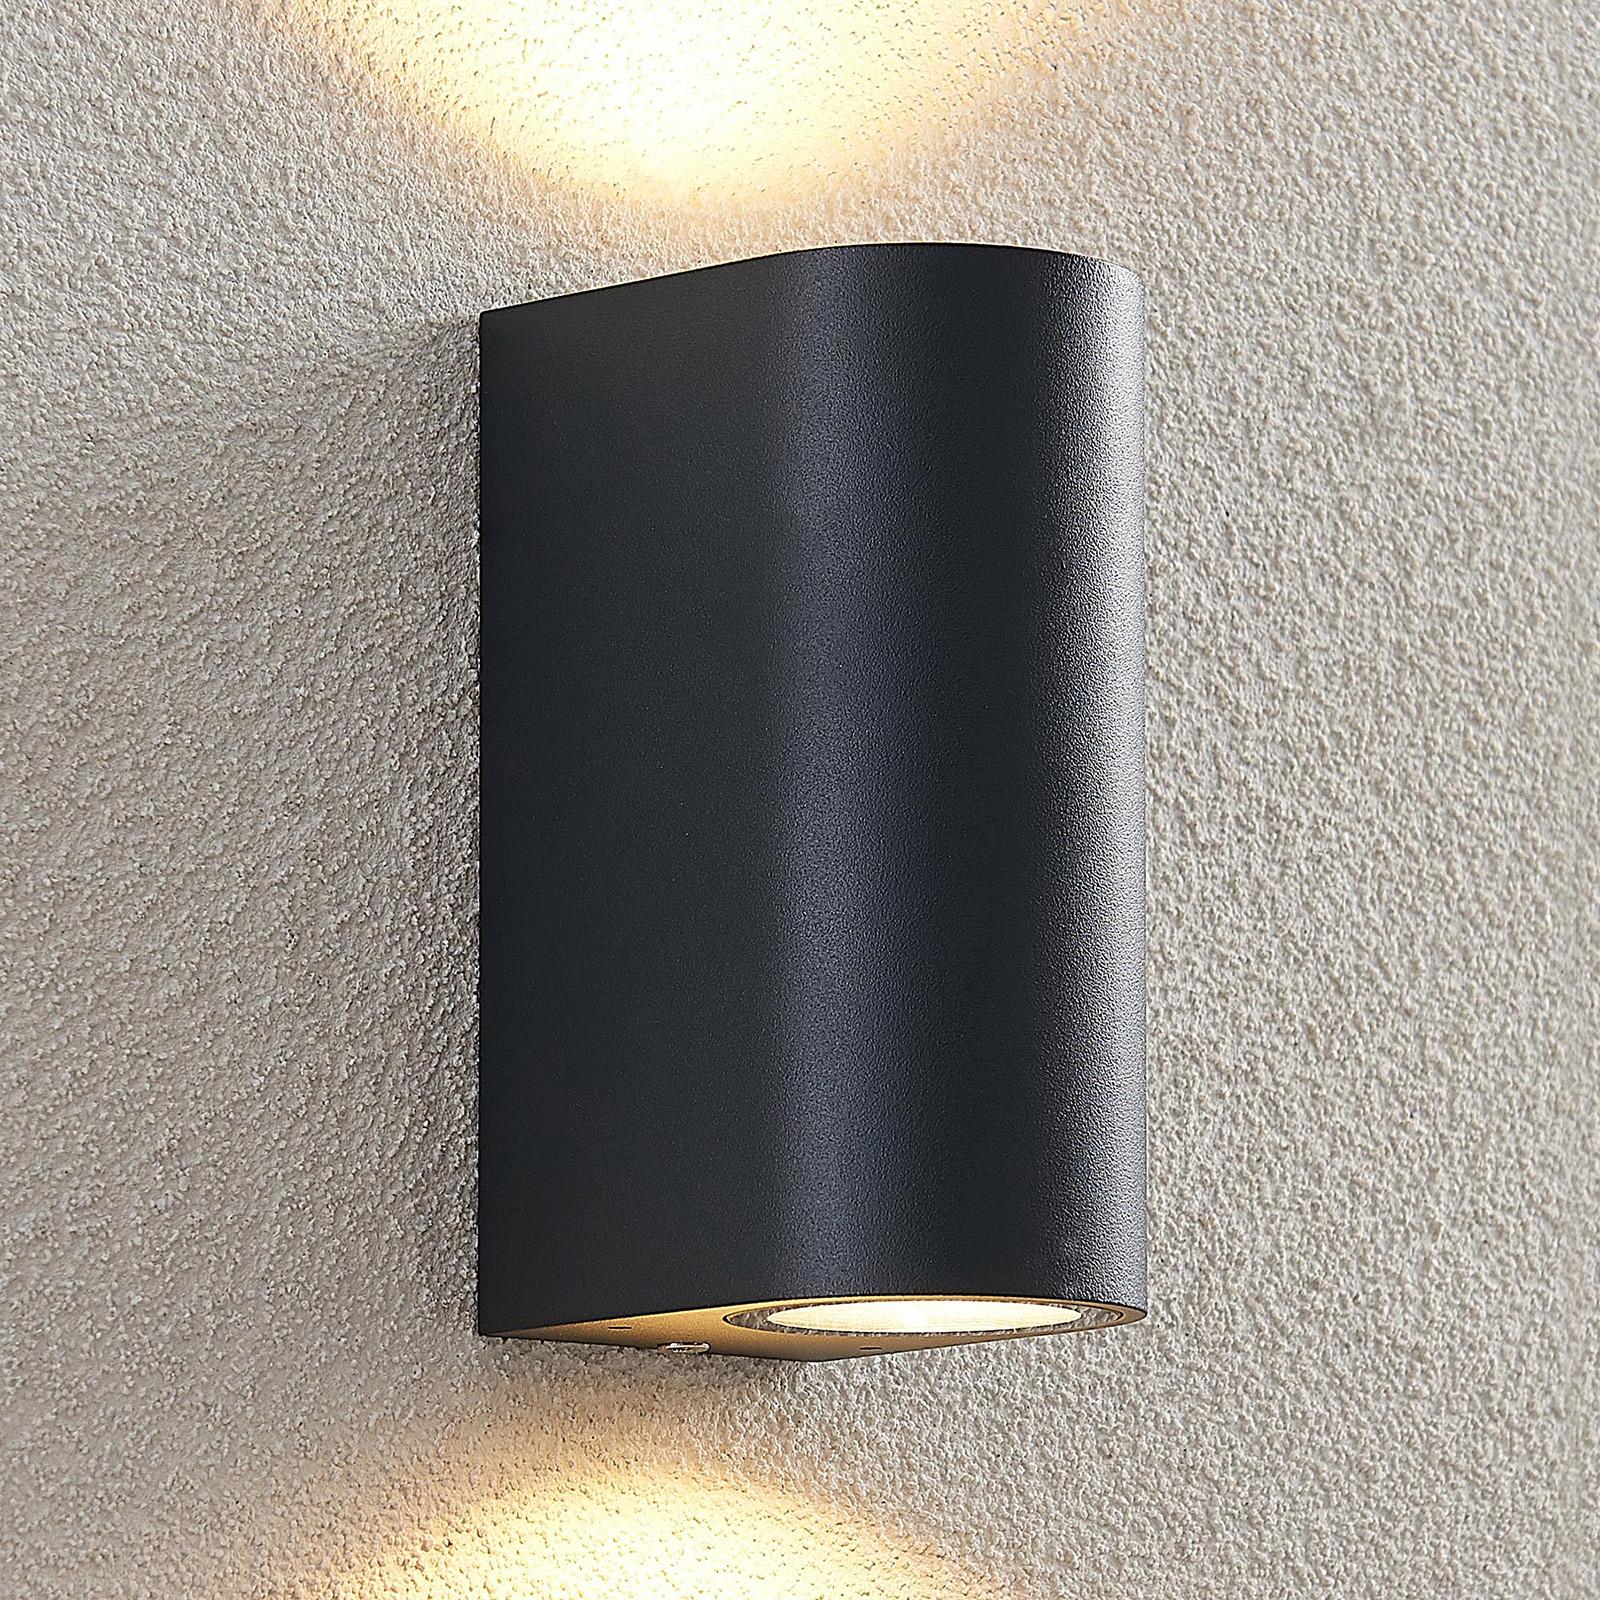 ELC Fijona LED outdoor wall lamp, round, 15 cm_9950875_1